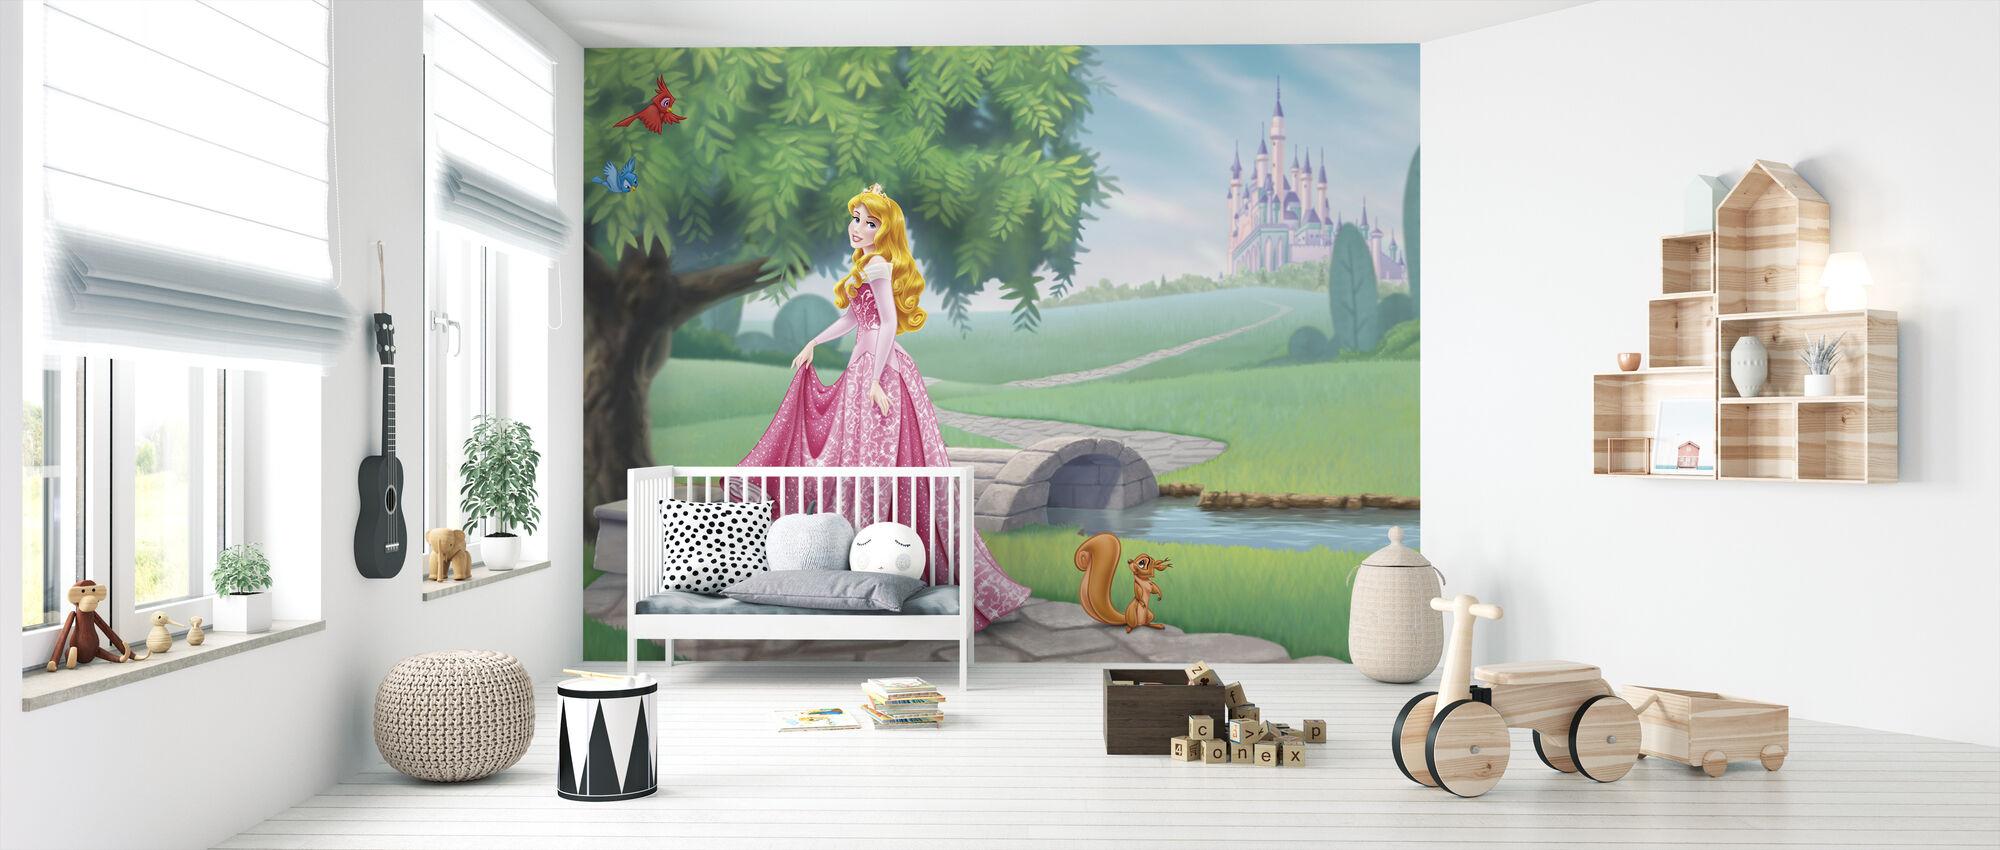 Disney Princess - Aurora - Tapetti - Vauvan huone